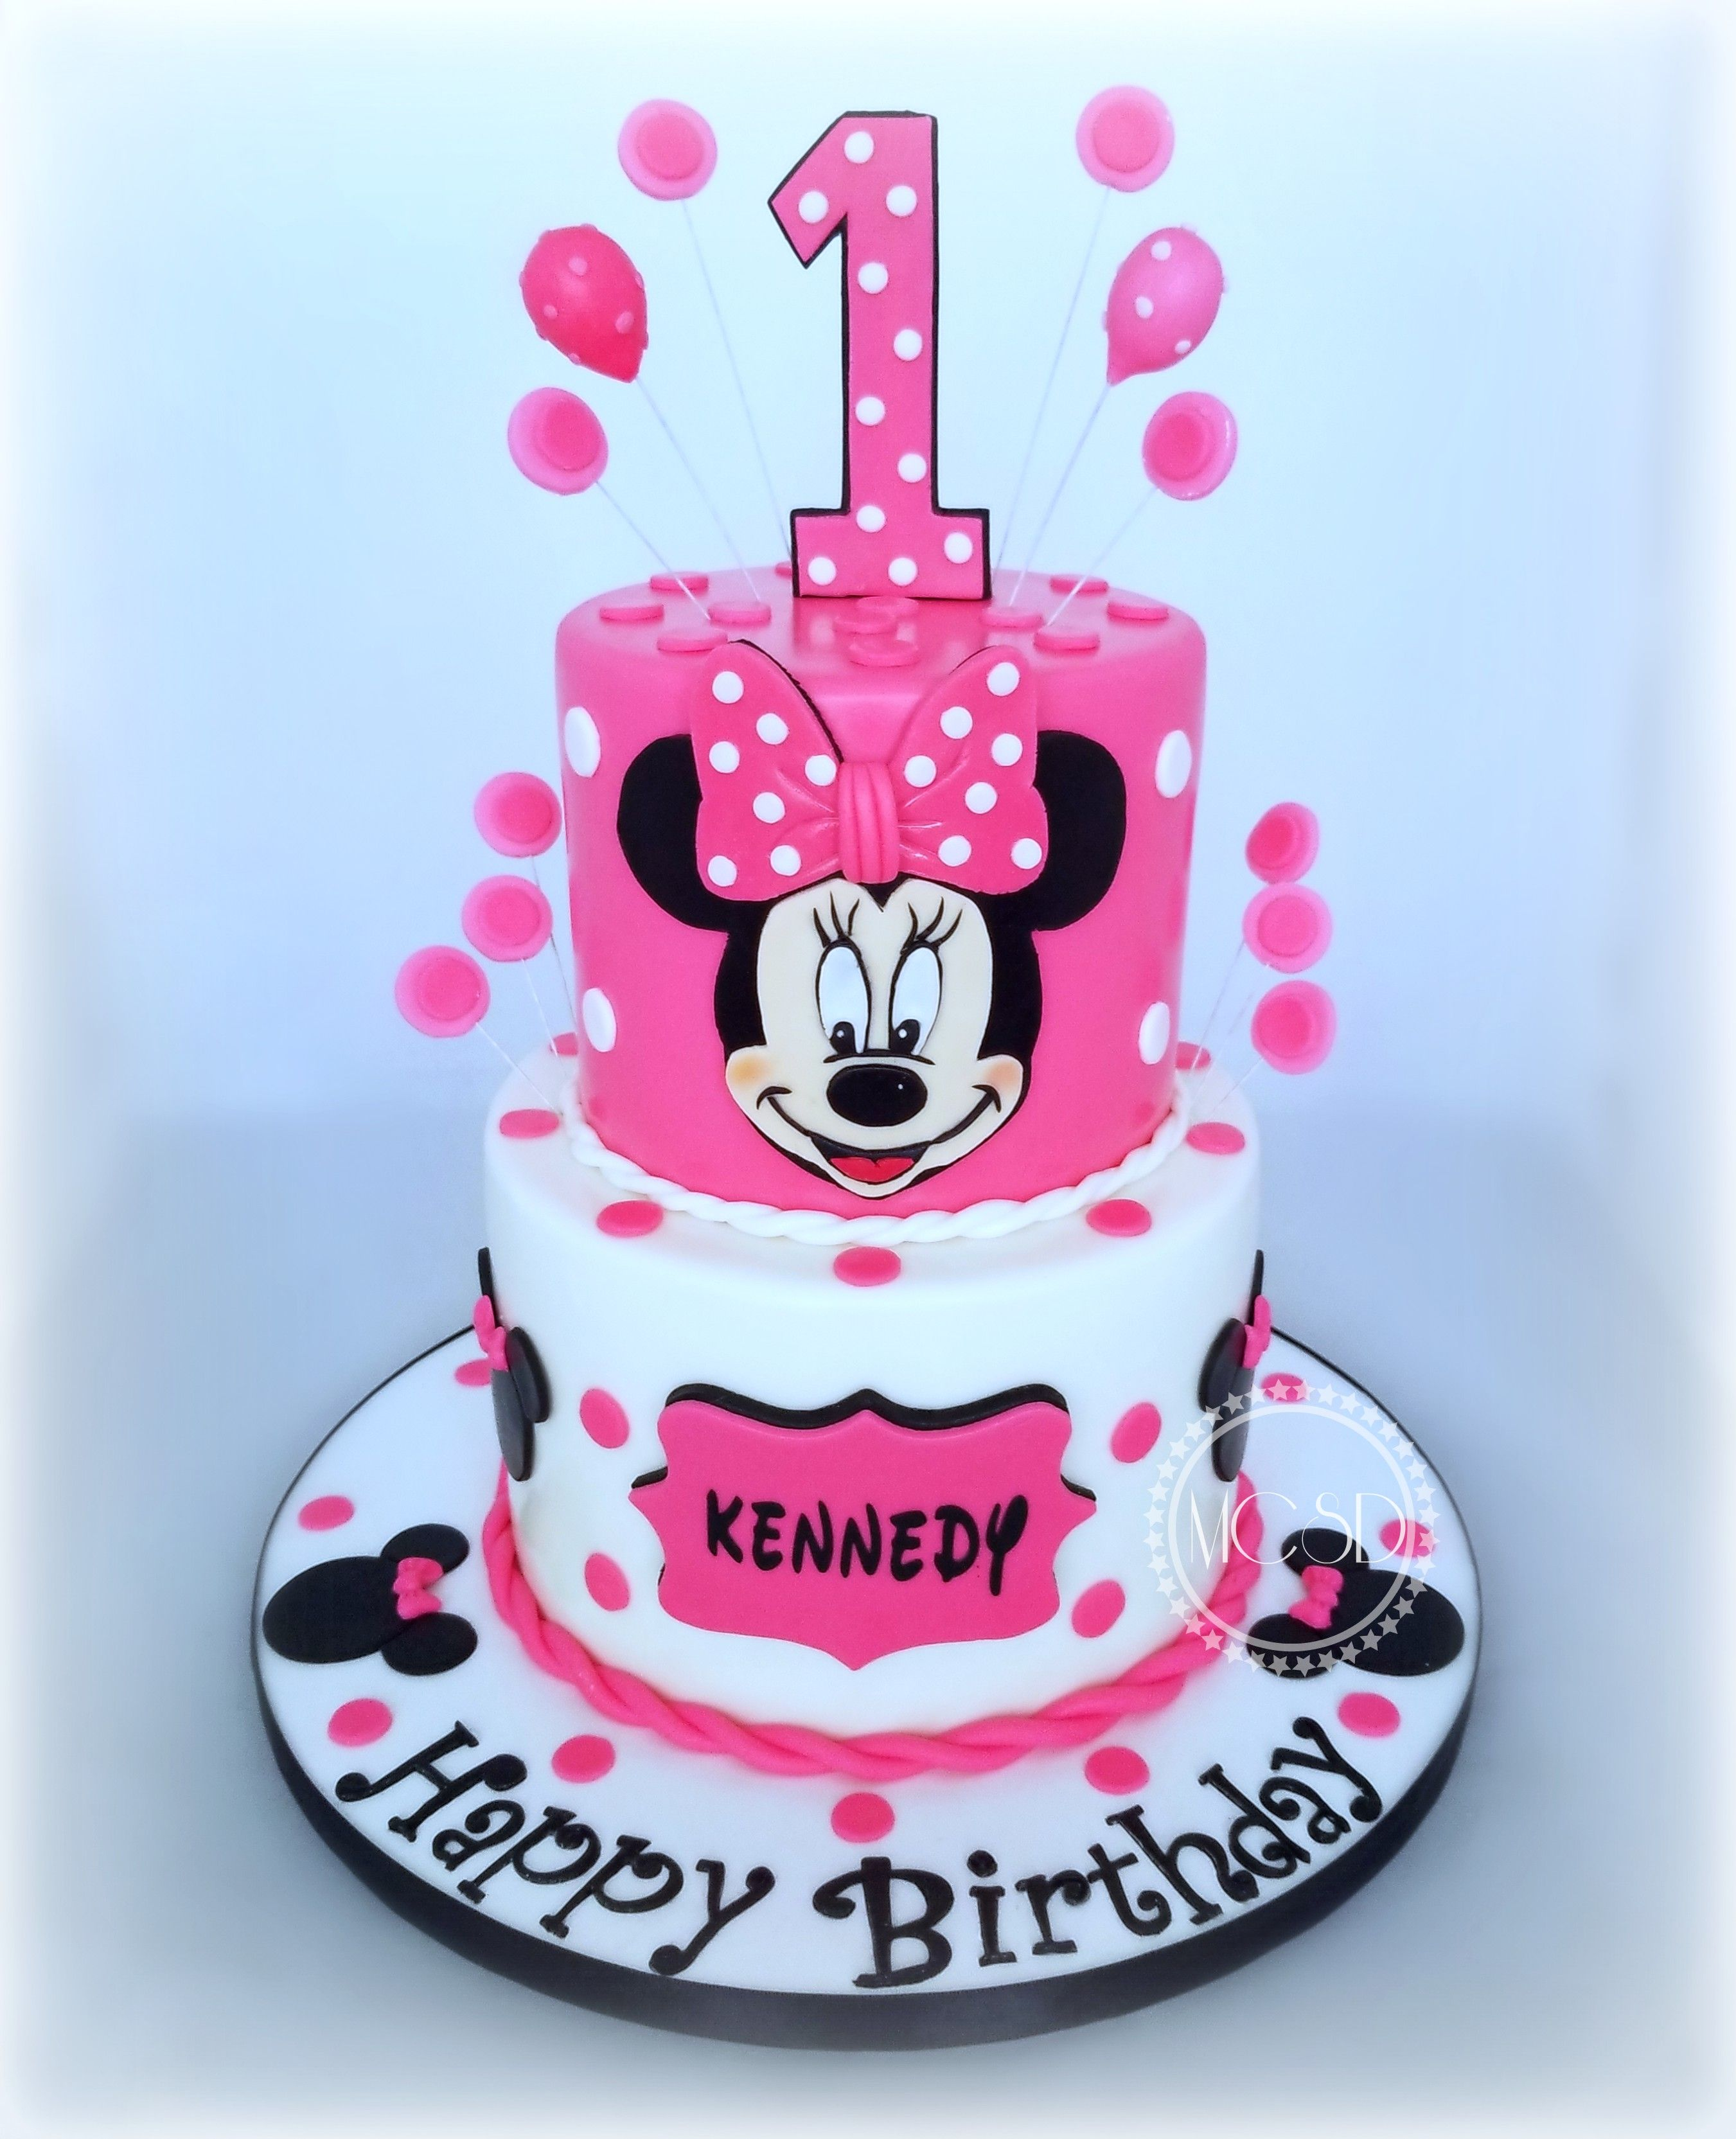 Pleasing Minnie Mouse 1St Birthday Cake Birthday Cake 1St Birthday Cake Funny Birthday Cards Online Elaedamsfinfo